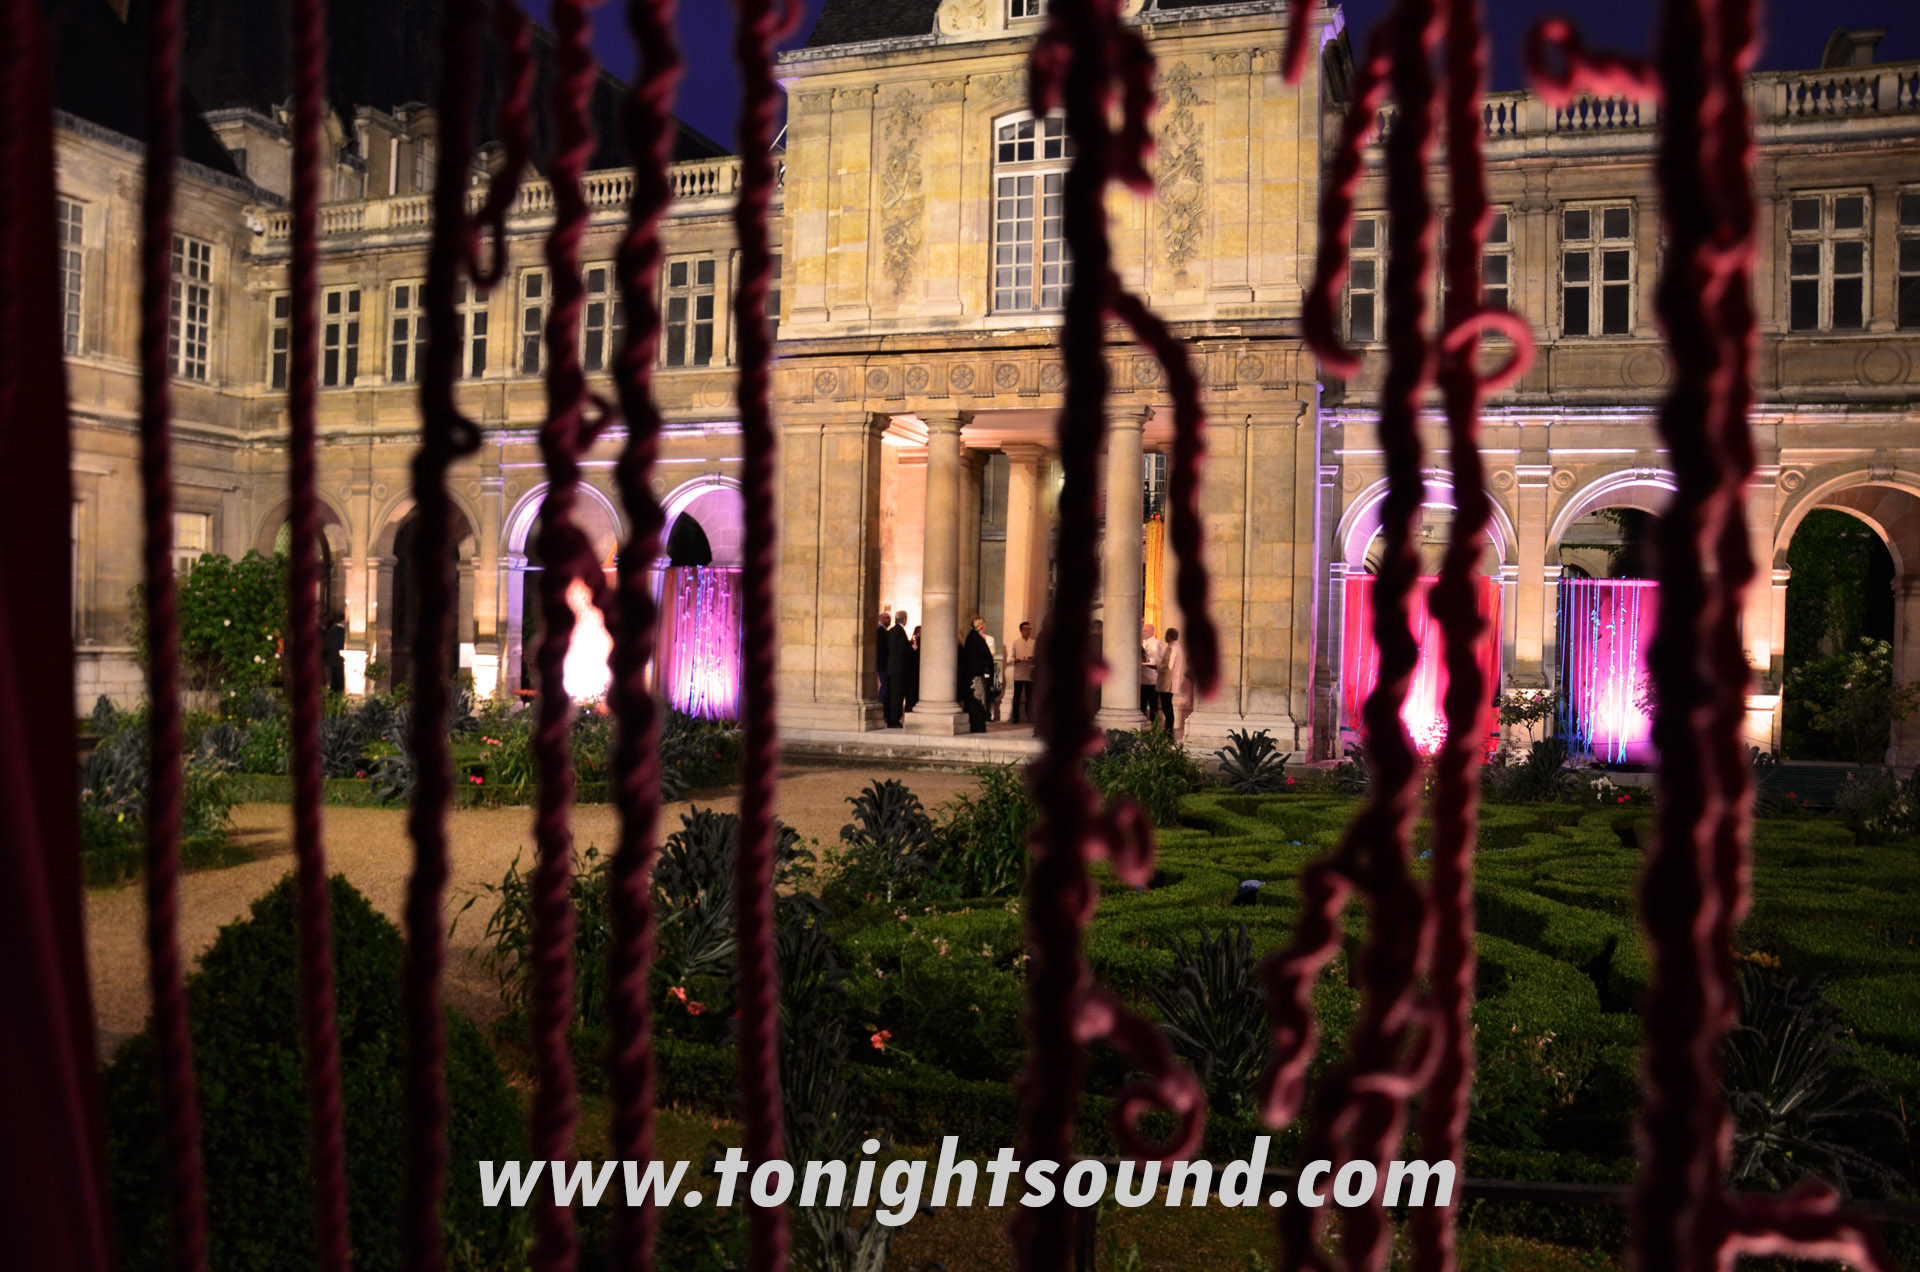 TONIGHTSOUND_SLIDE_14-musee-carnavalet-chloe